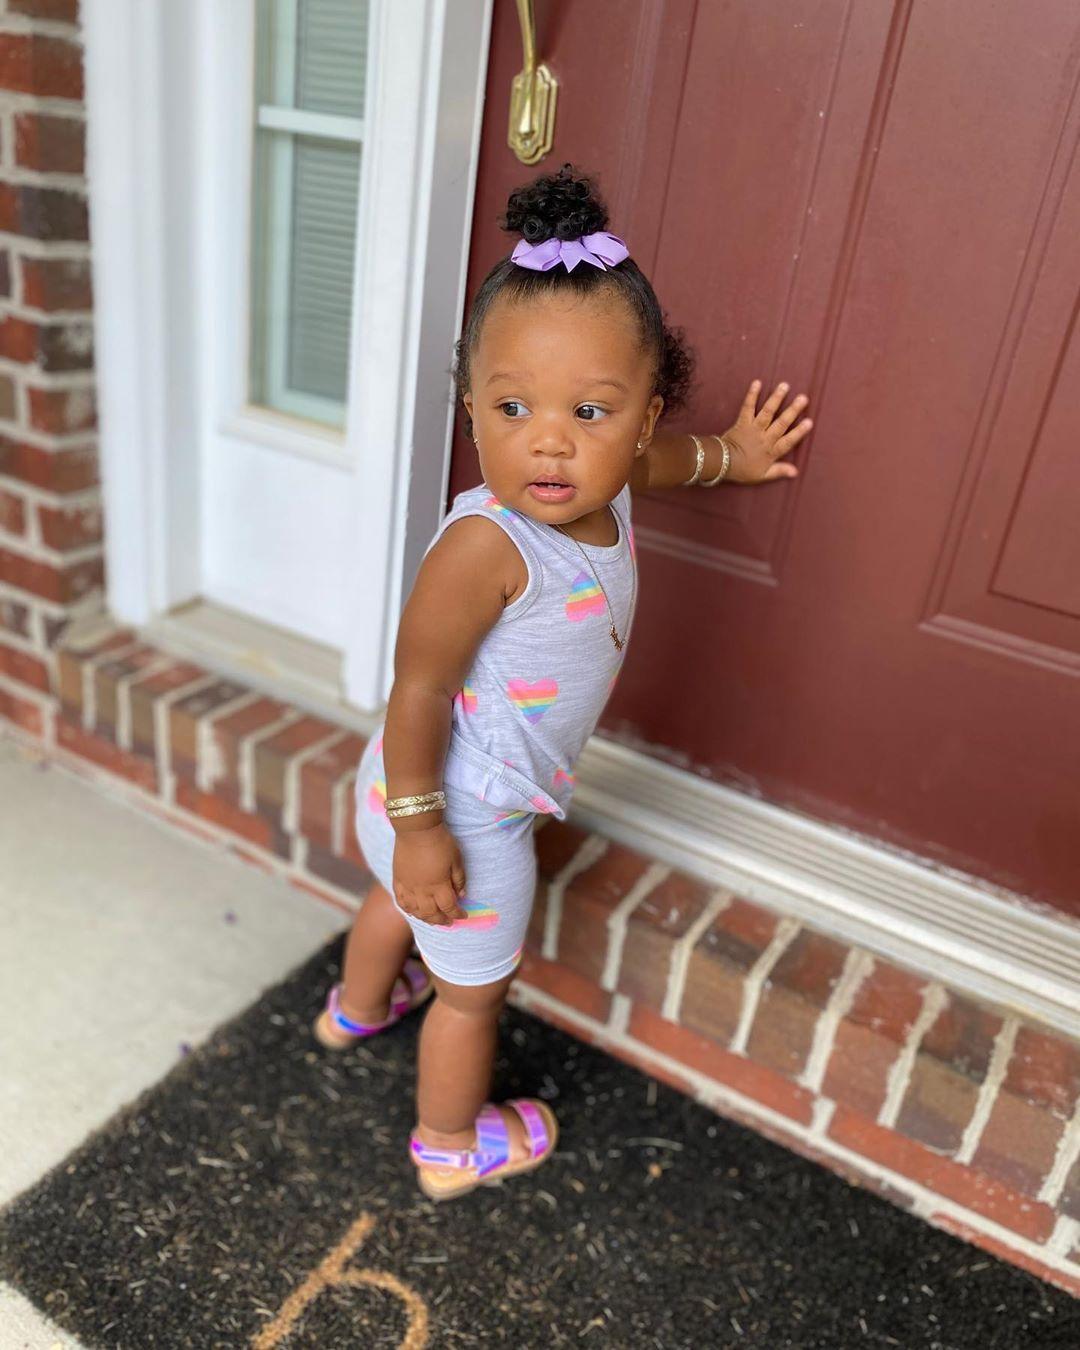 💜🤞🏼 • • • #minimodel #bestdressed #dopekidz #flybabies #perfectbabies #scoutme #ig_fashionkids #followme #cutest_kiddies #babymodels…